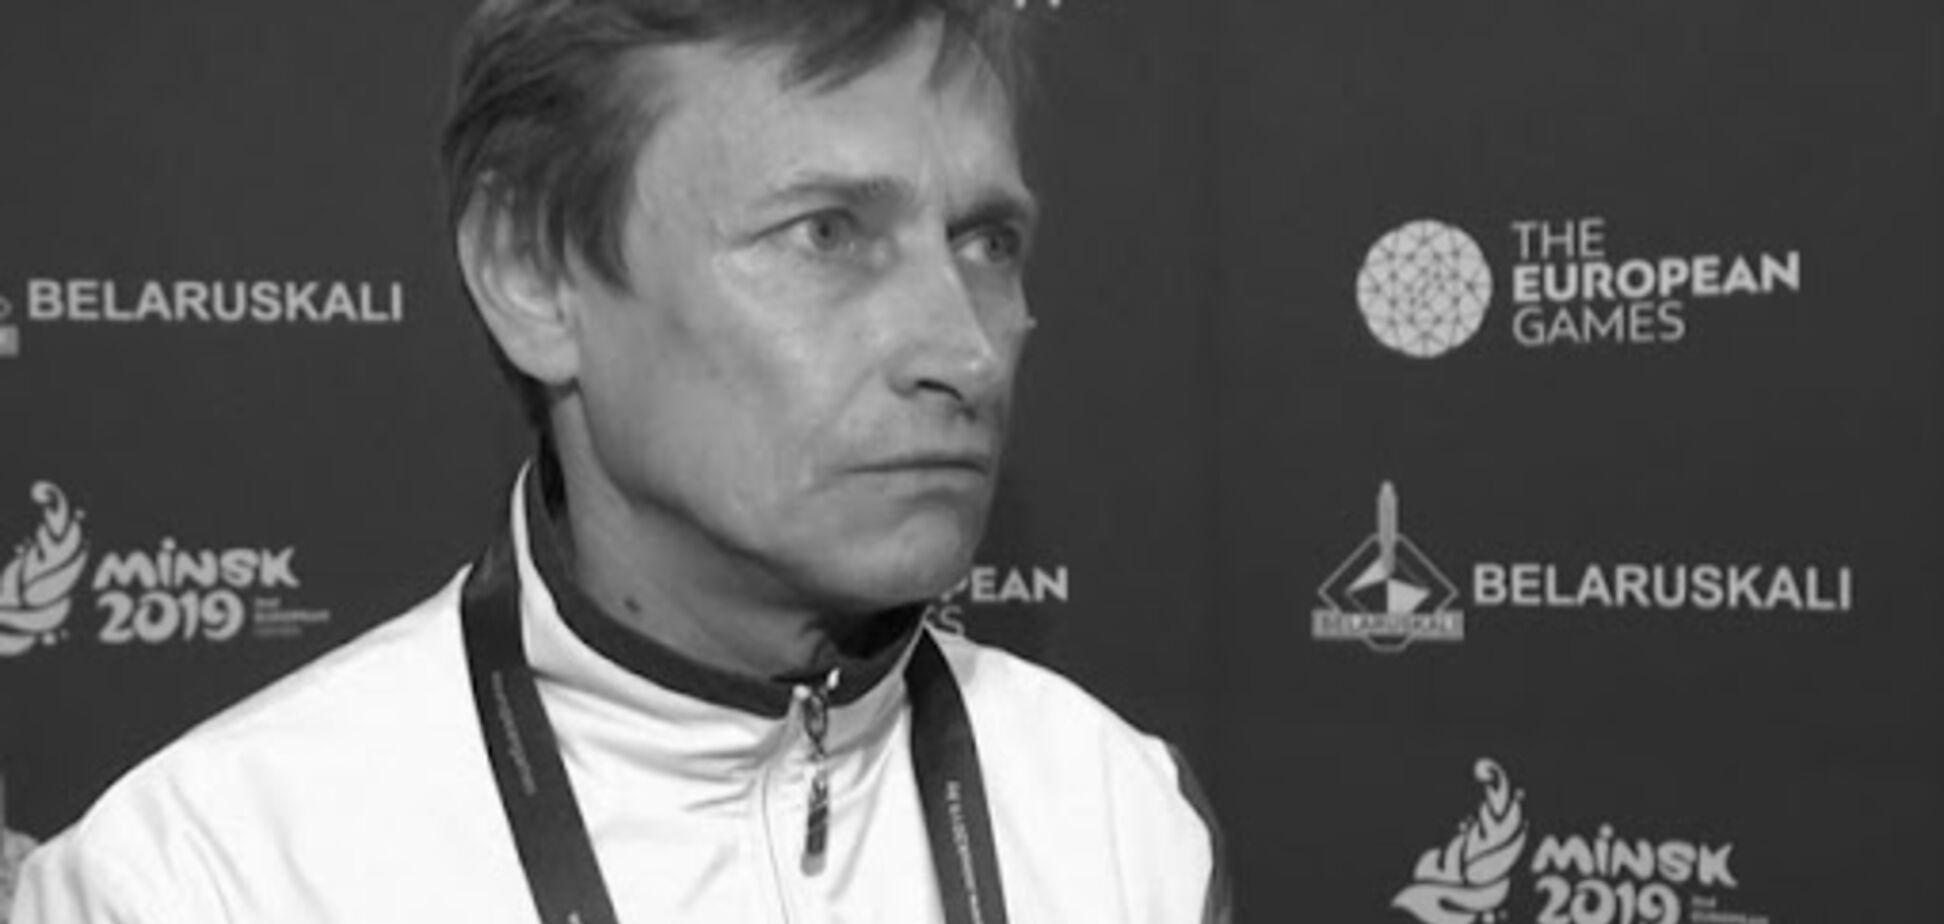 Внезапно умер тренер сборной Беларуси по каратэ